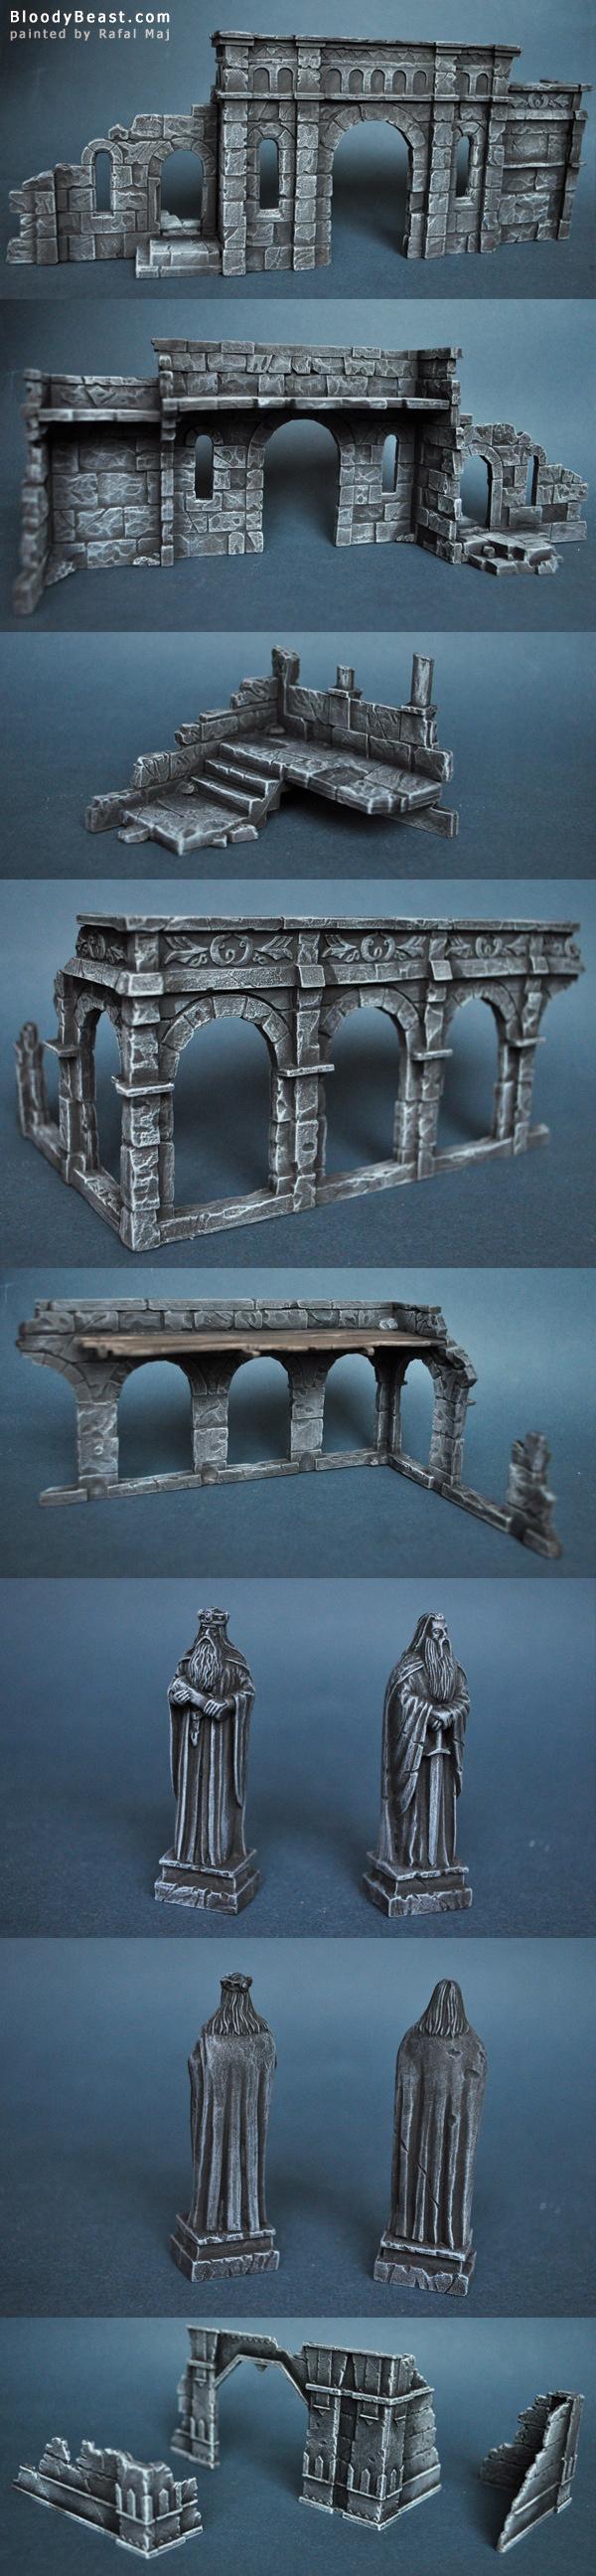 Ruins of Osgiliath painted by Rafal Maj (BloodyBeast.com)